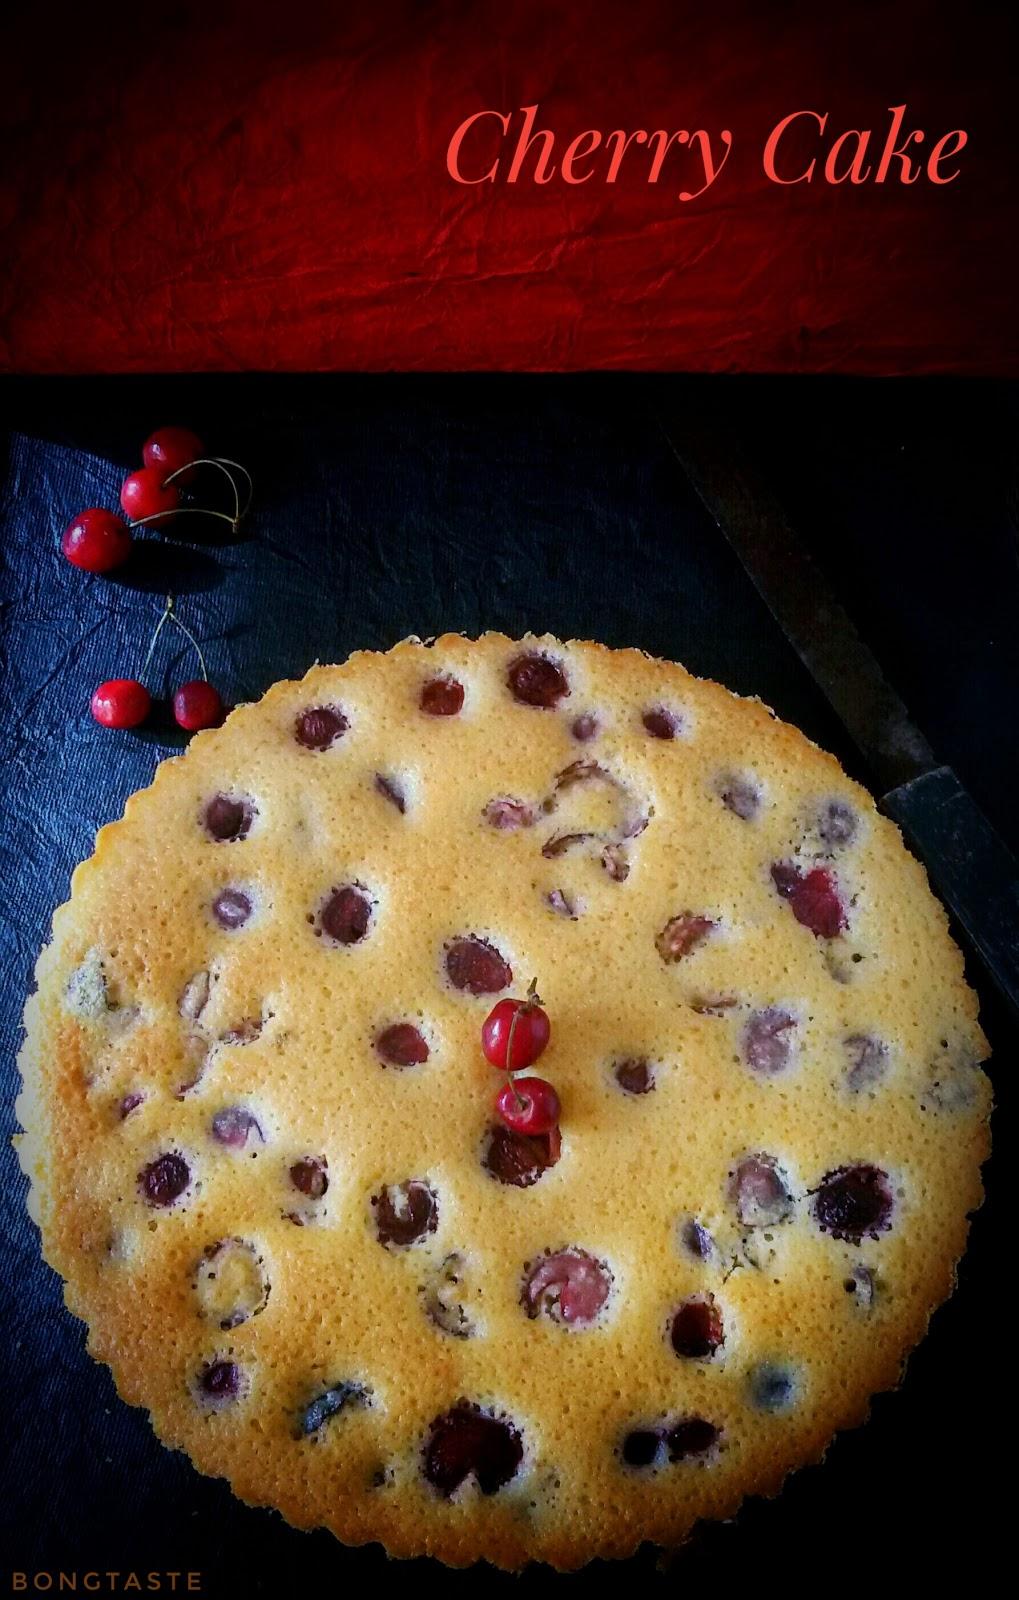 Adding Fresh Fruit To Cake Batter